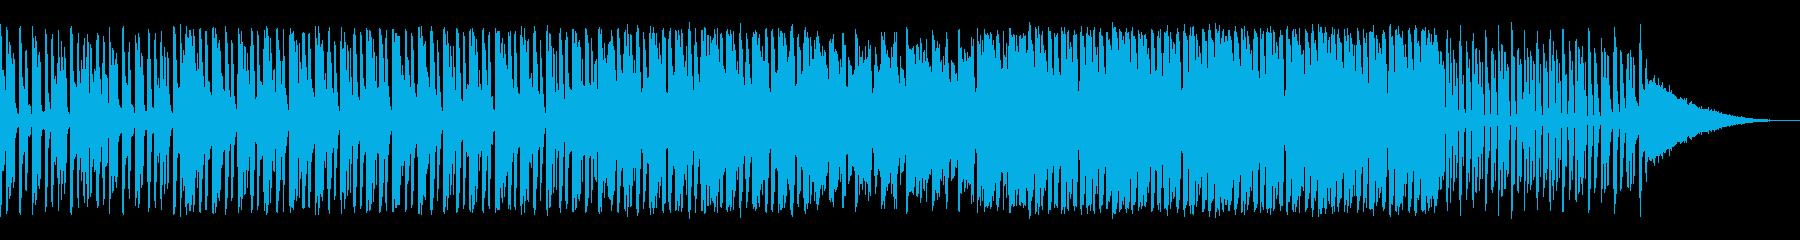 Jazz風レゲエ♫reggaeの再生済みの波形